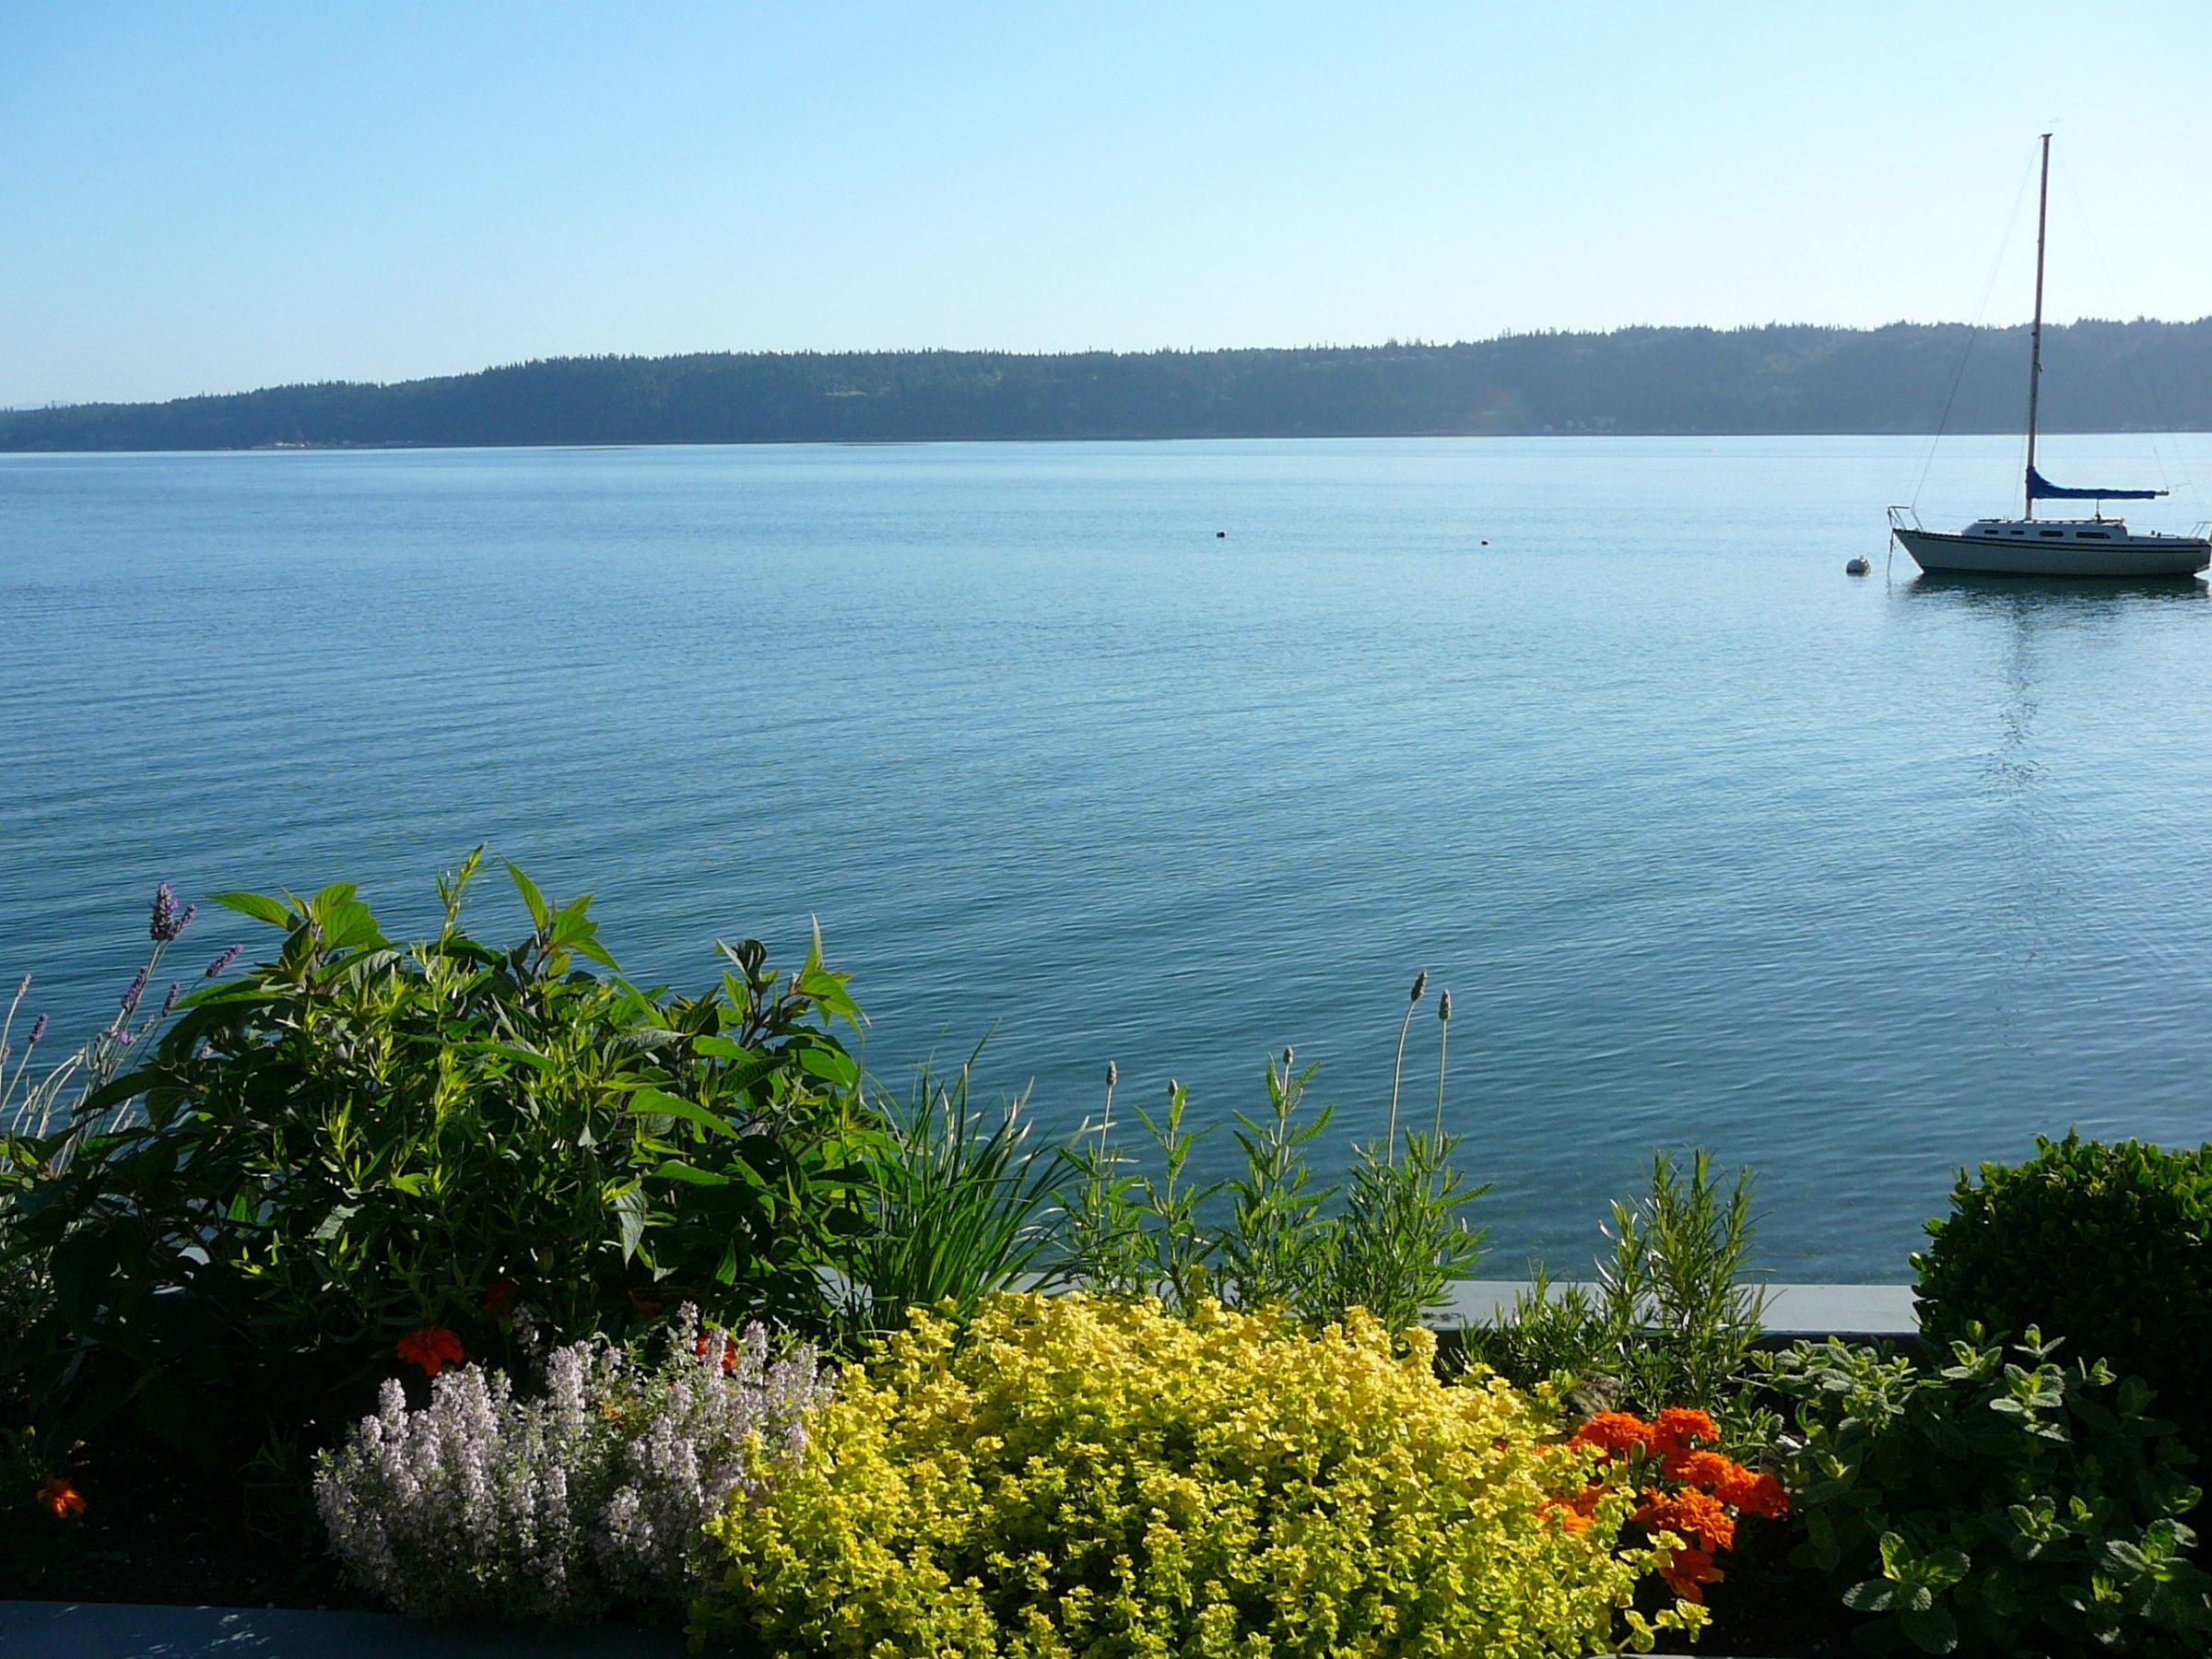 Single Family Home for Sale at Blue Moon Beach House Blue Moon Beach House 3267 Shoreline Dr Camano Island, Washington 98282 United States